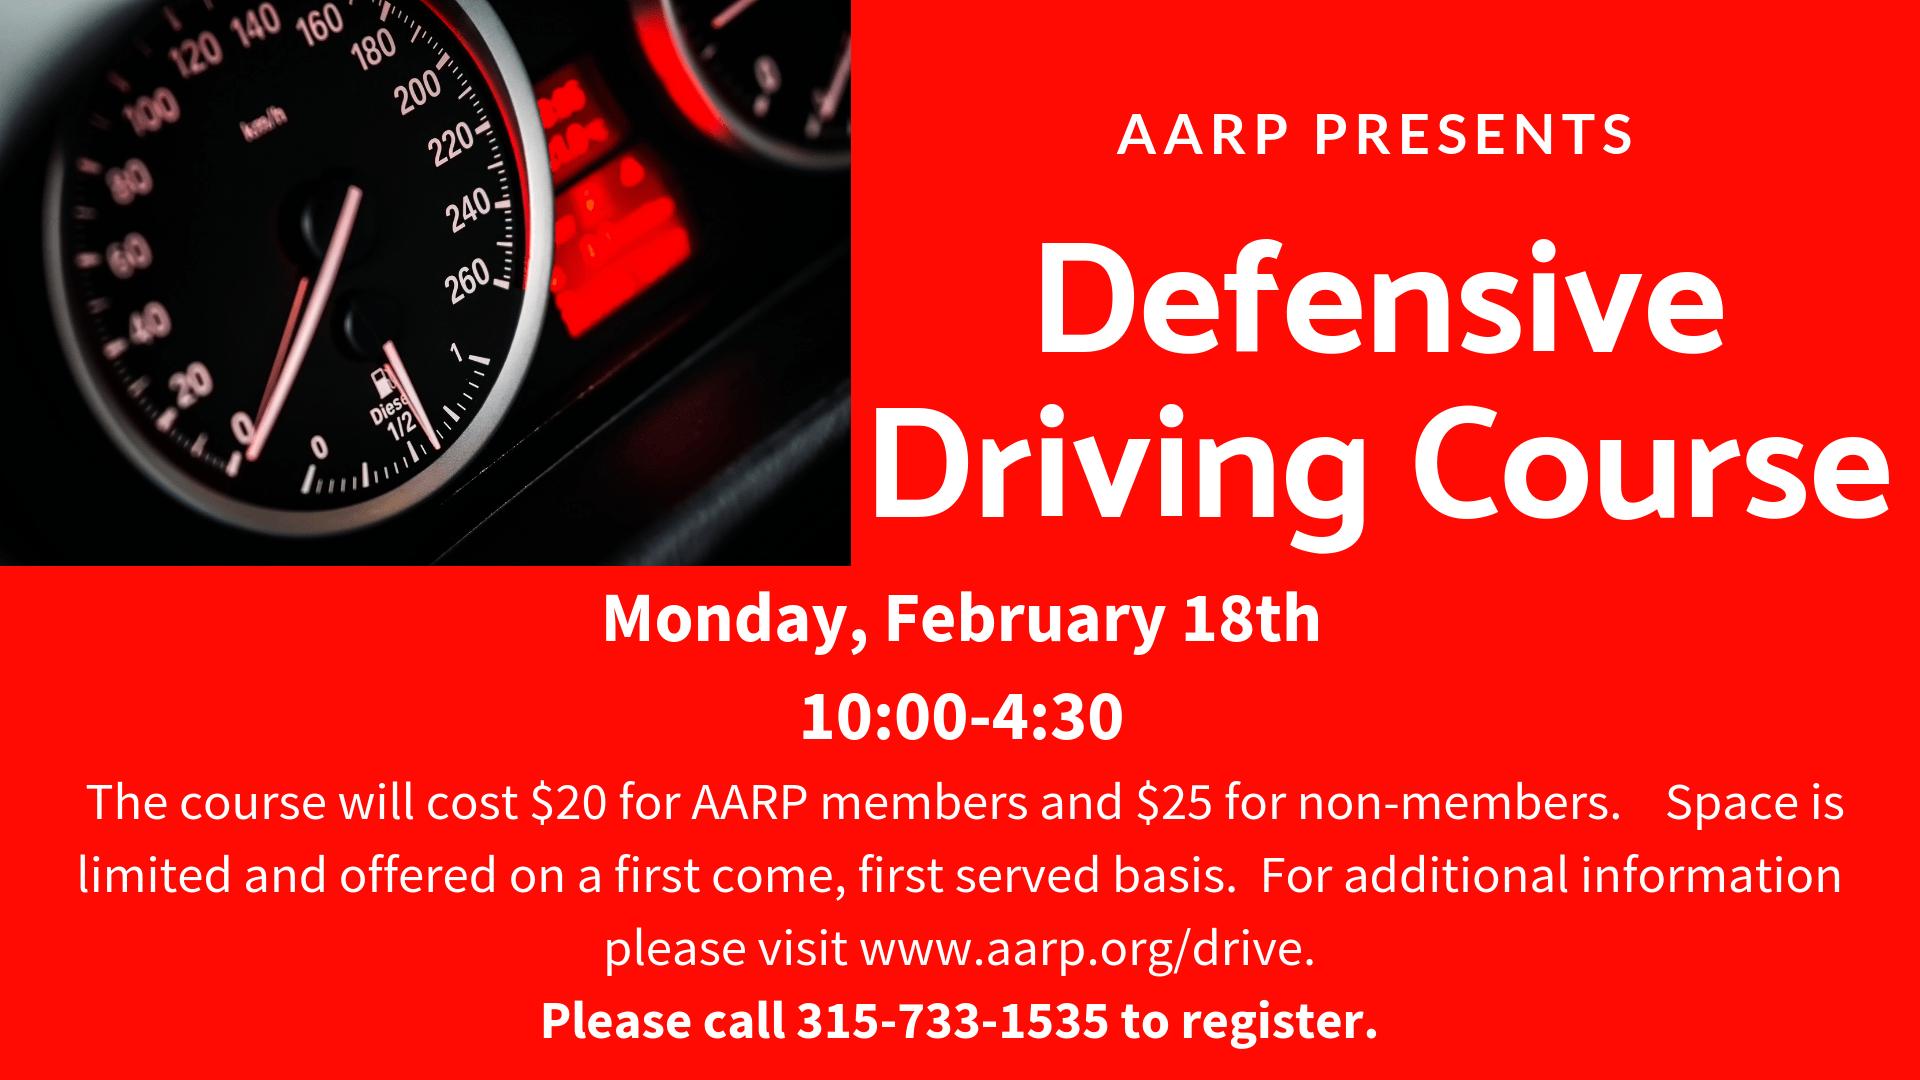 AARP Defensive Driving Course 10:00-4:30 – New Hartford